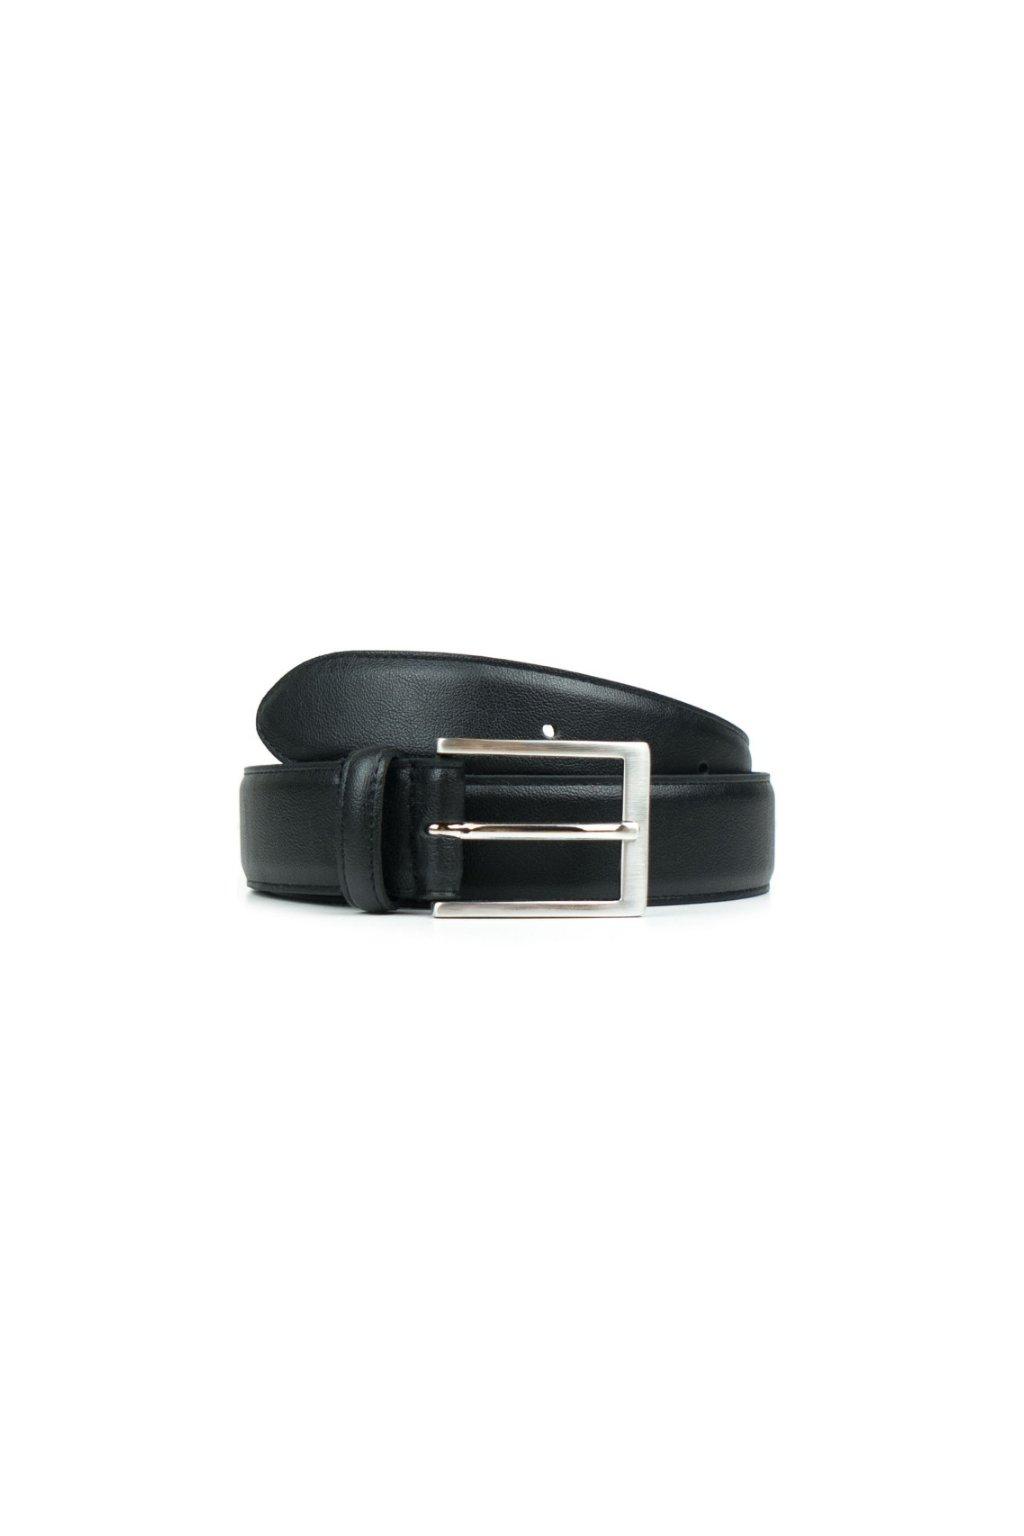 "Čierny opasok ""Classic 3,5cm Belt Black"""